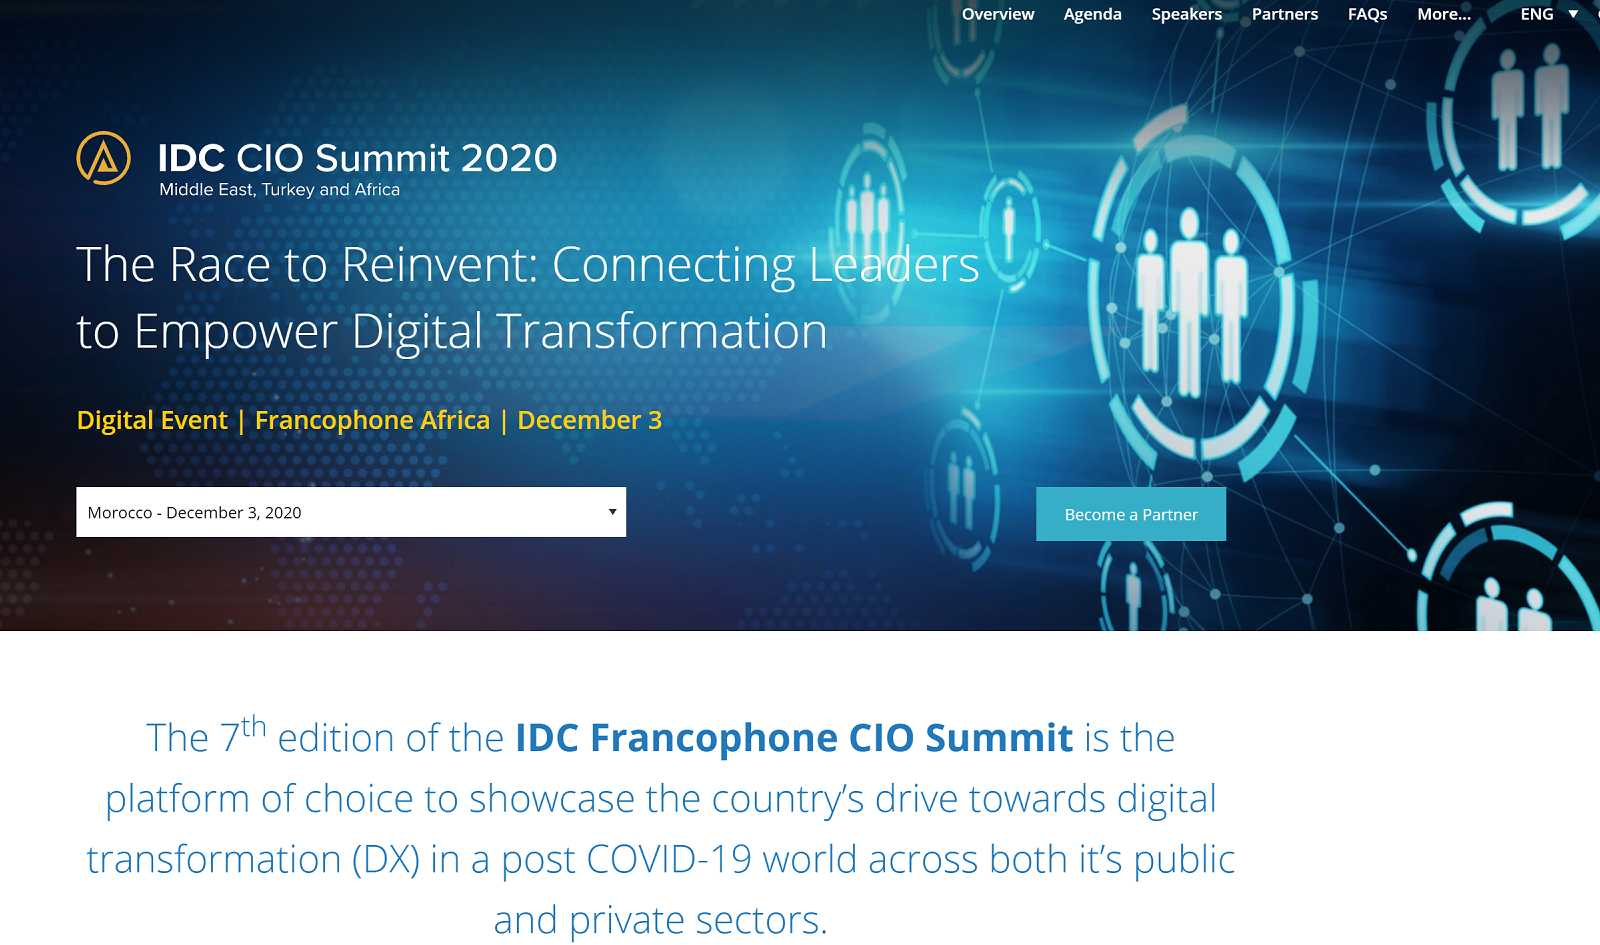 IDC CIO Summit Francophone Africa 2020 W